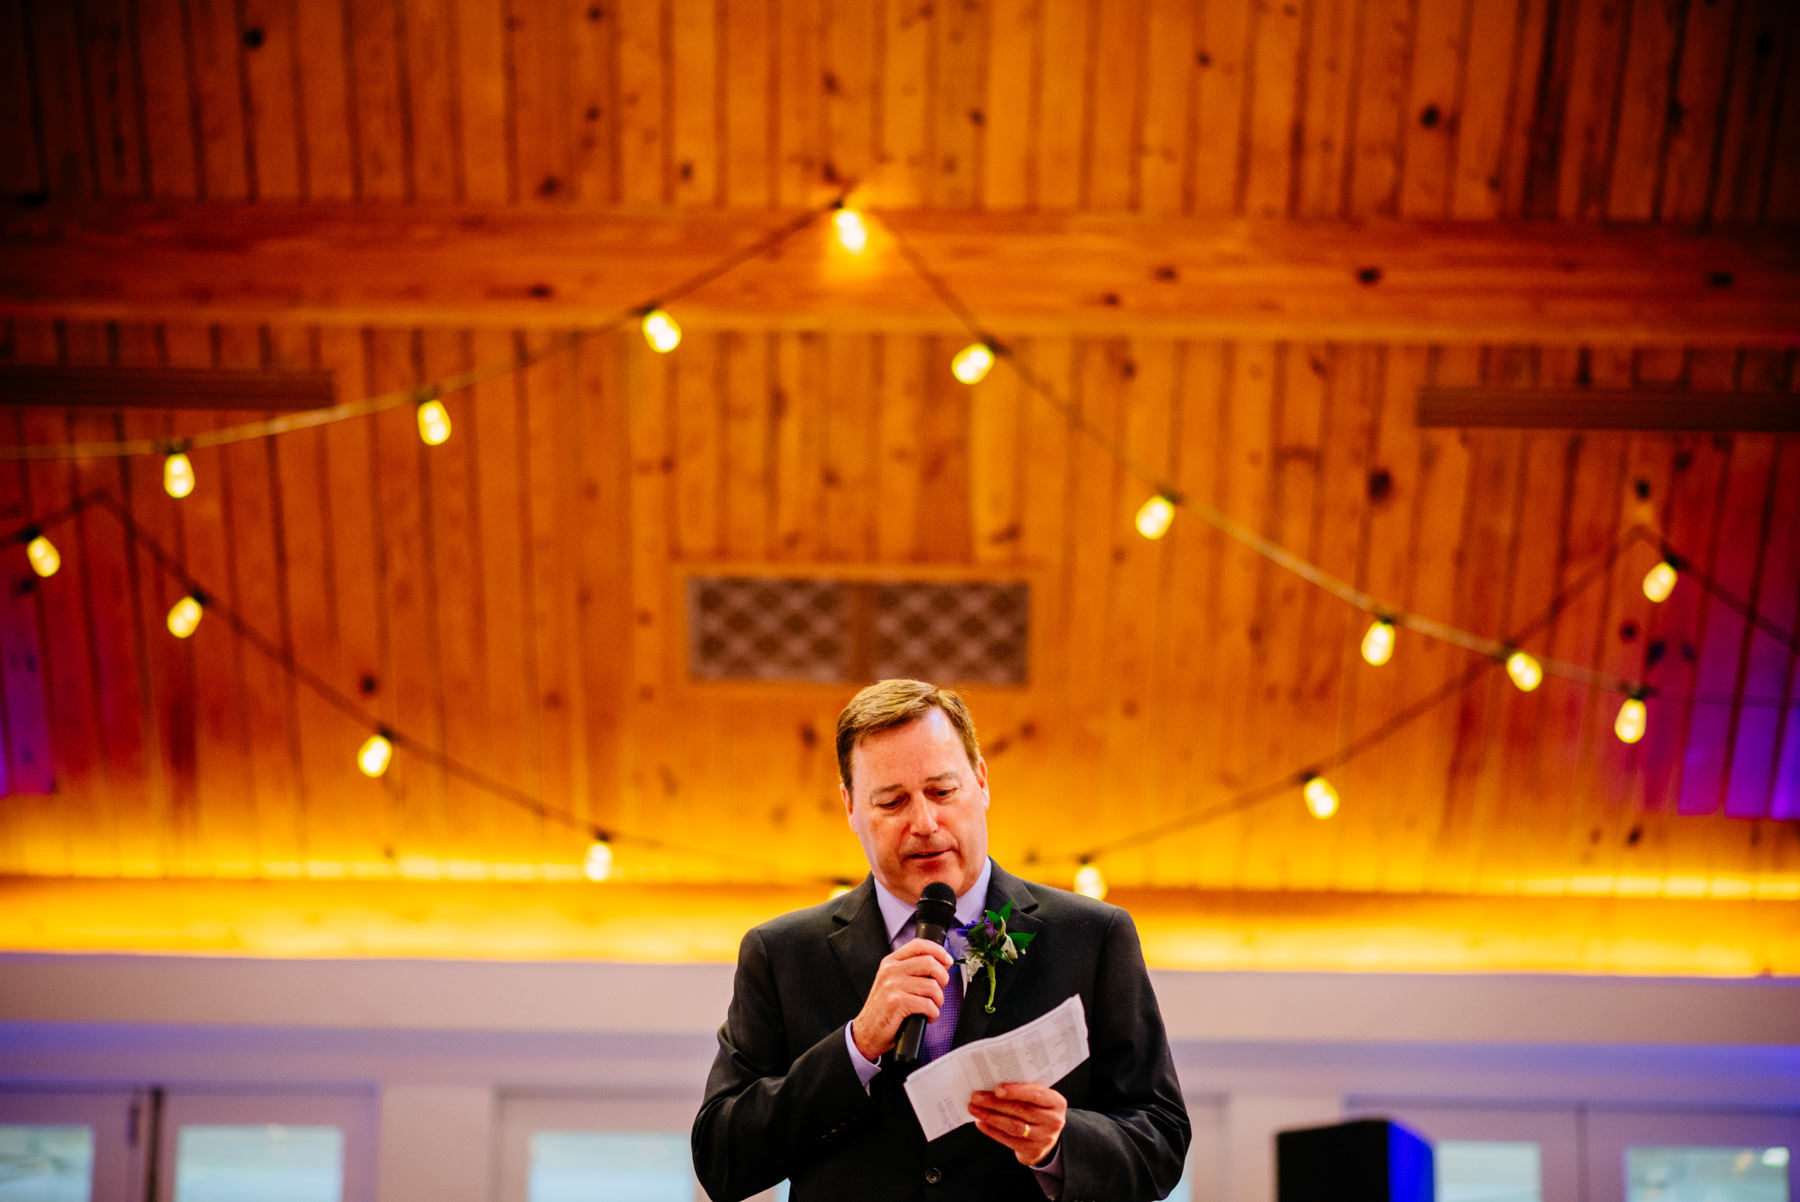 dad giving speech at wedding